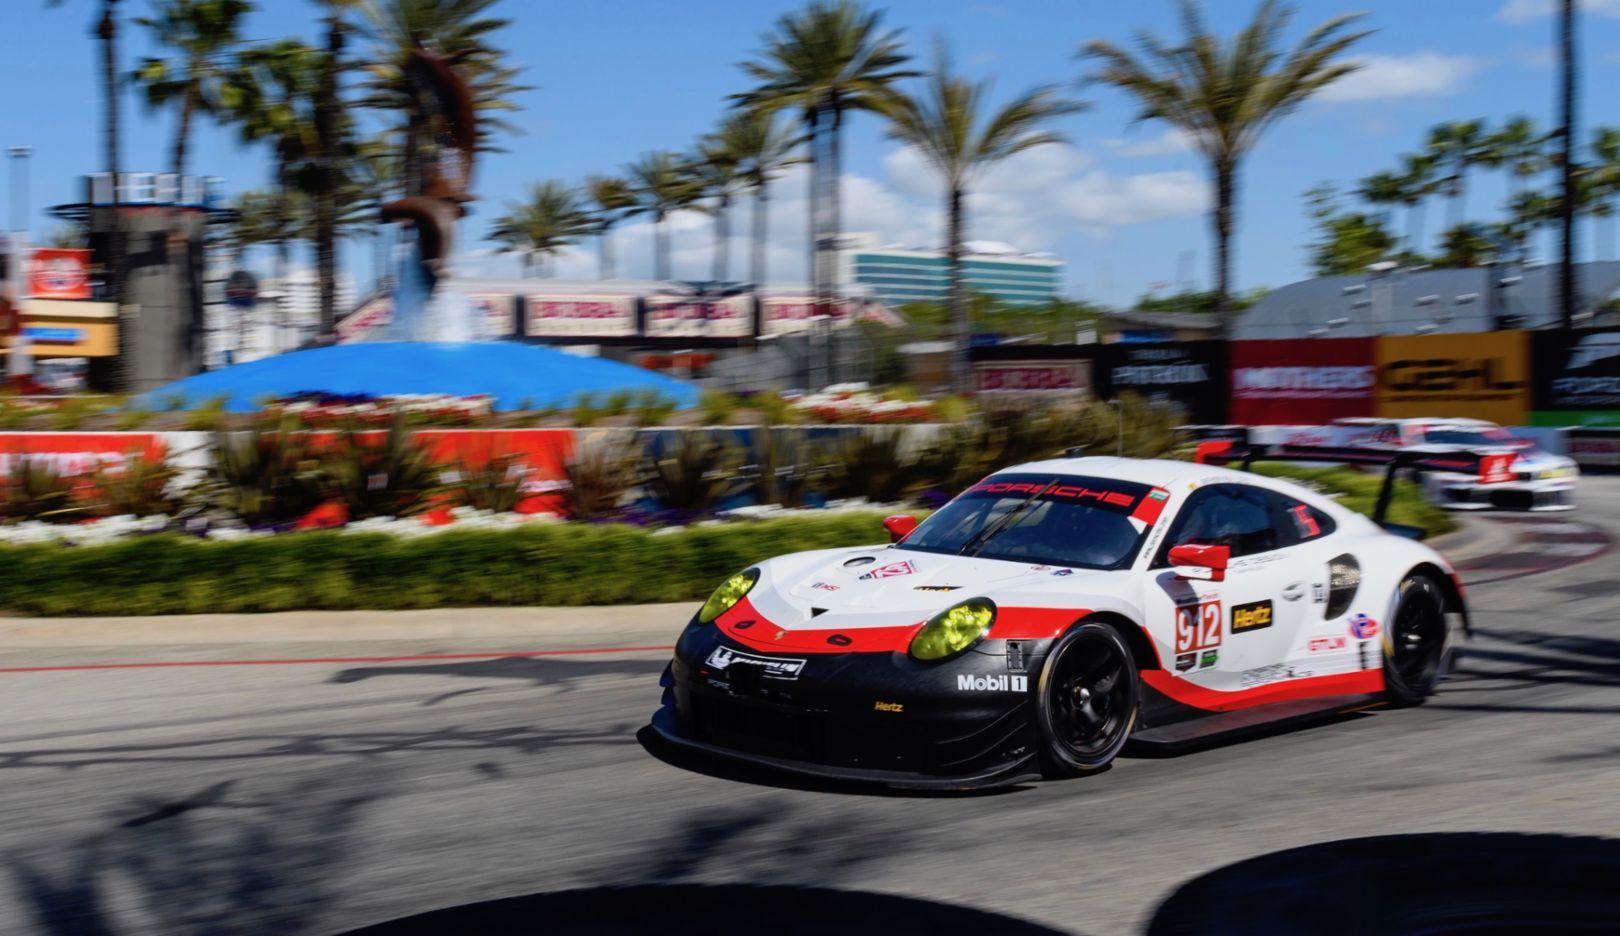 911 RSR, IMSA SportsCar Championship, Long Beach, USA, 2017, Porsche AG